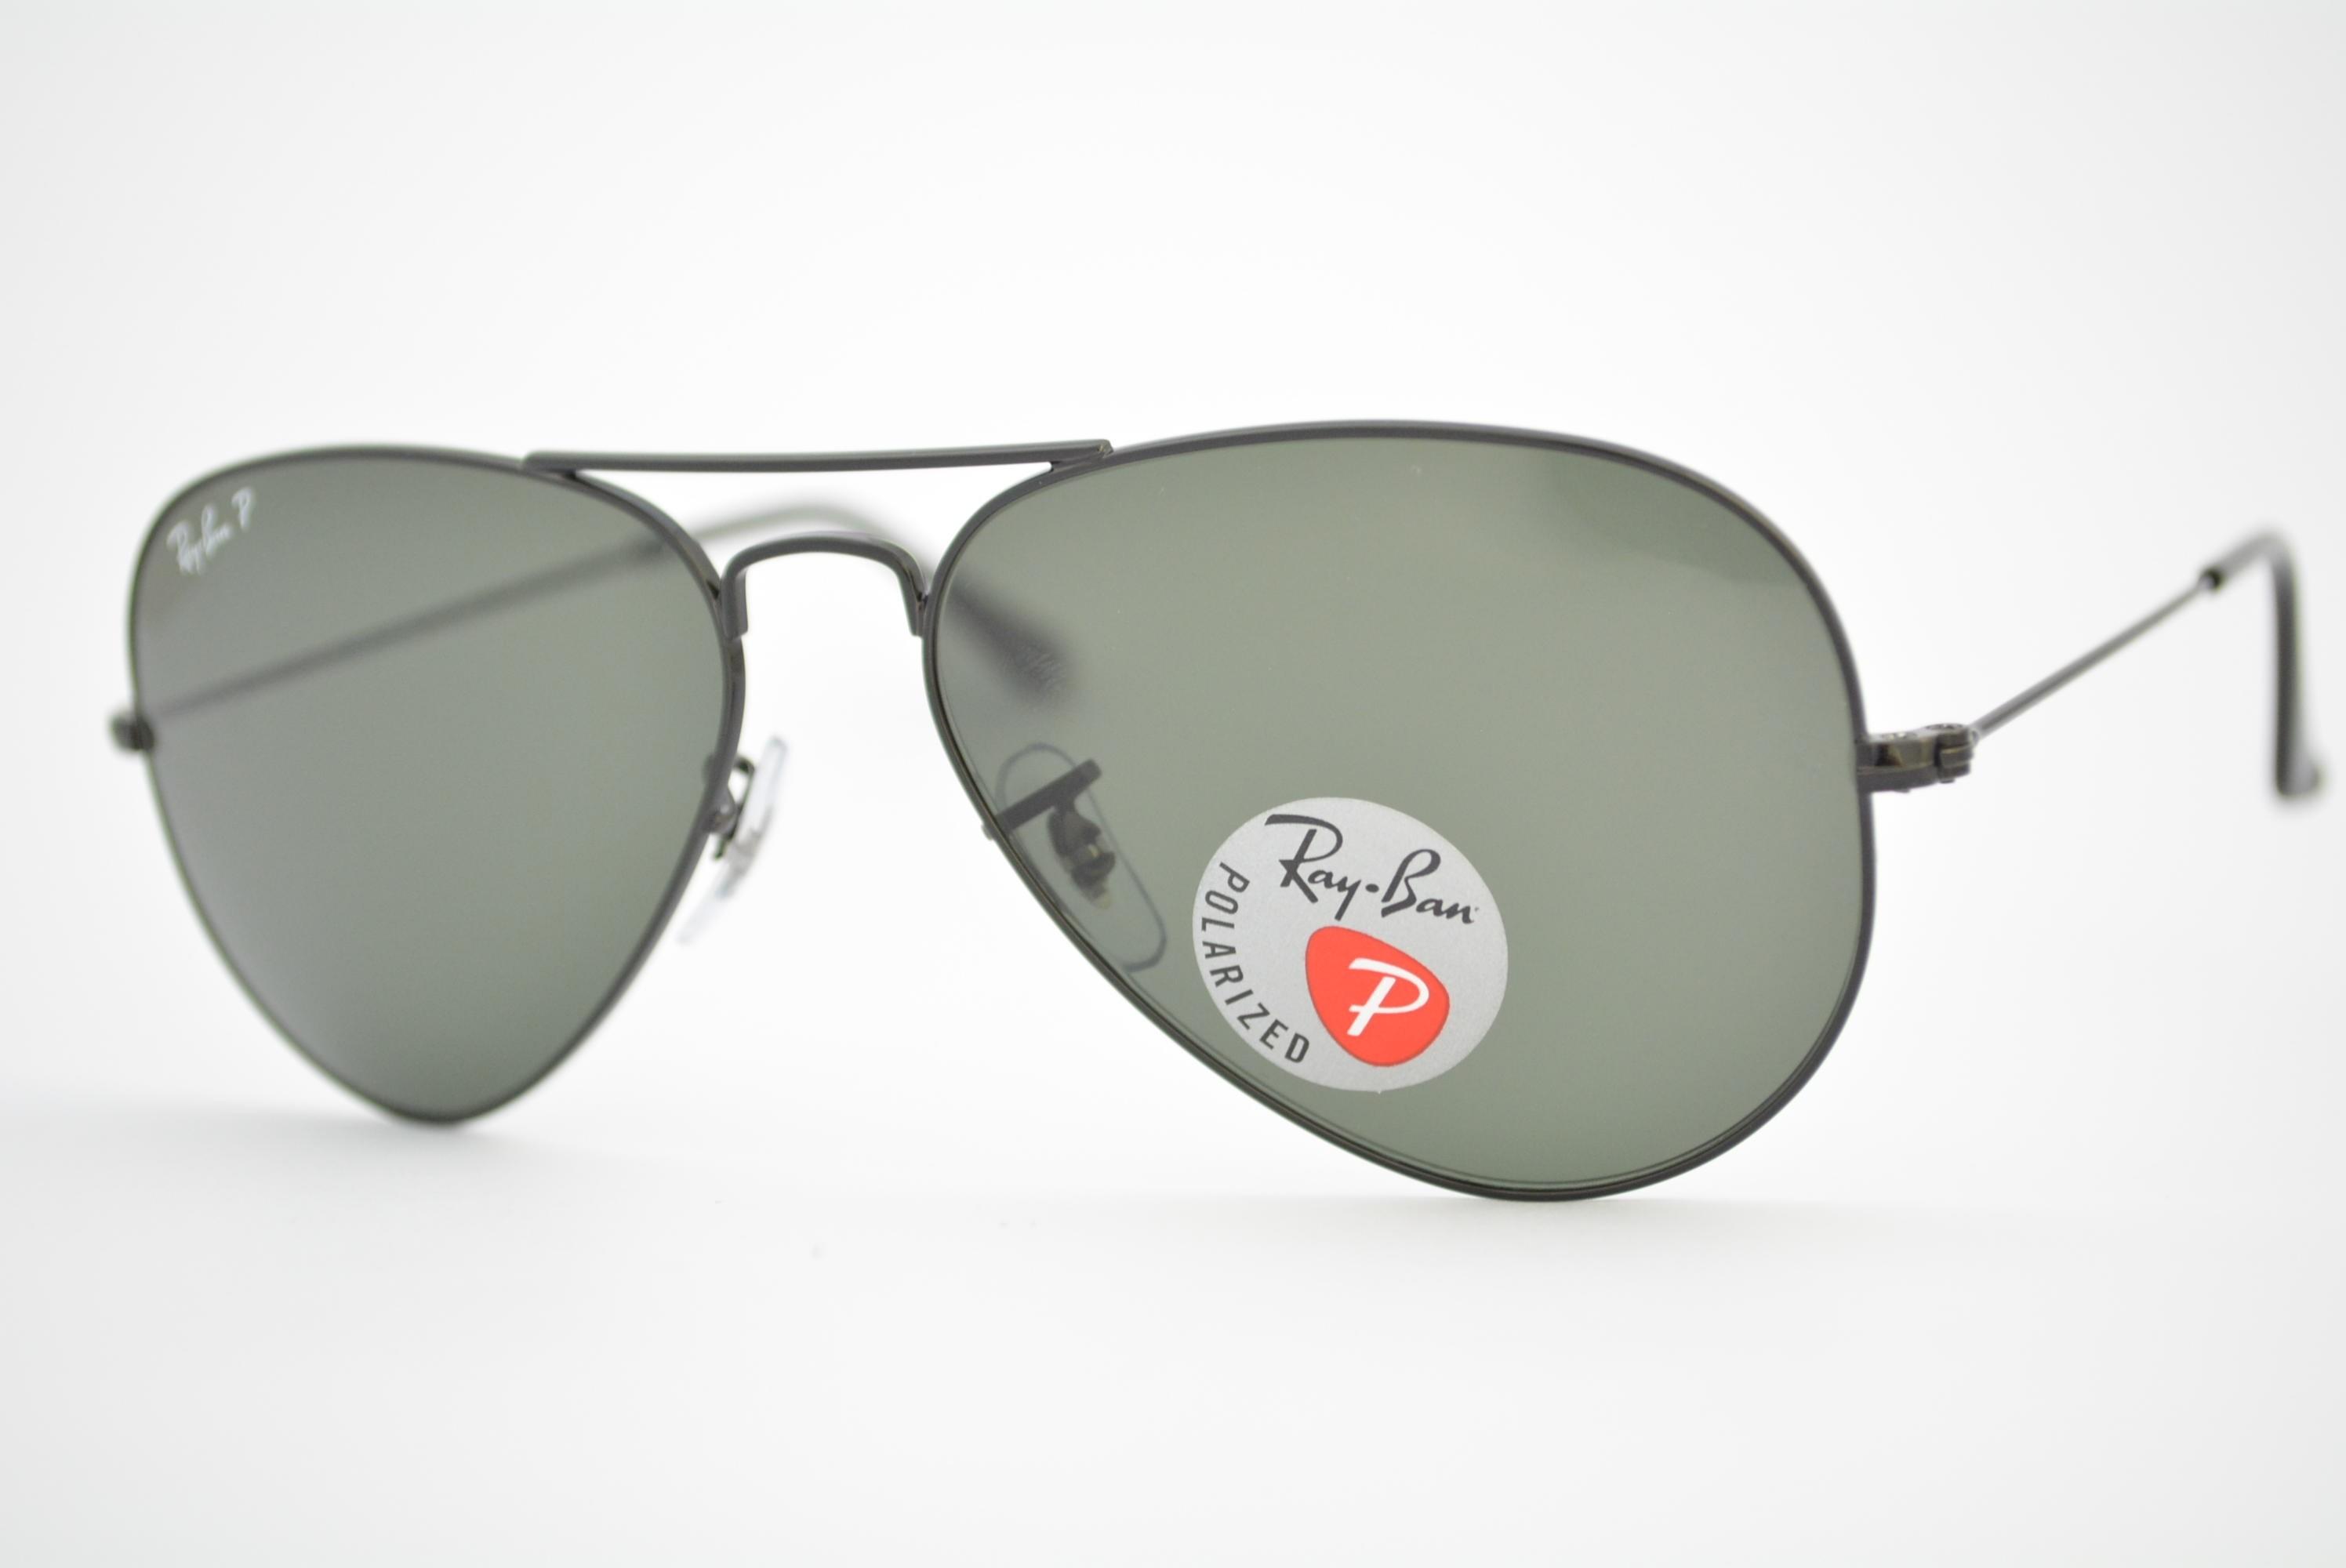 ba2ed69379f6f óculos de sol Ray Ban aviator large mod rb3025 002 58 tamanho 55 polarizado